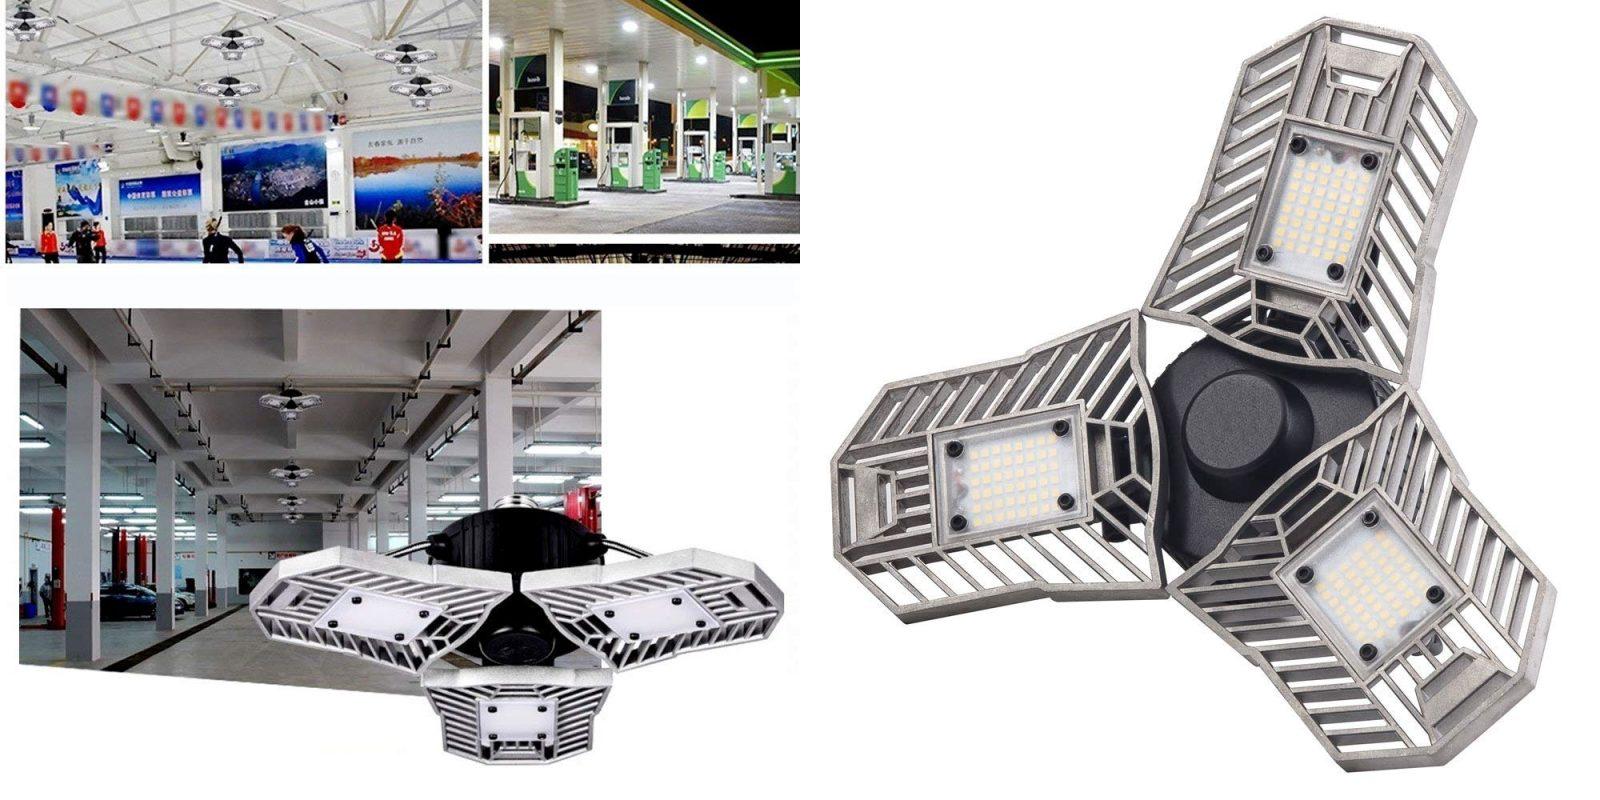 Enjoy a brighter garage w/ a motion-sensing 6,000 lumen LED light: $32.50 (Reg. $50)